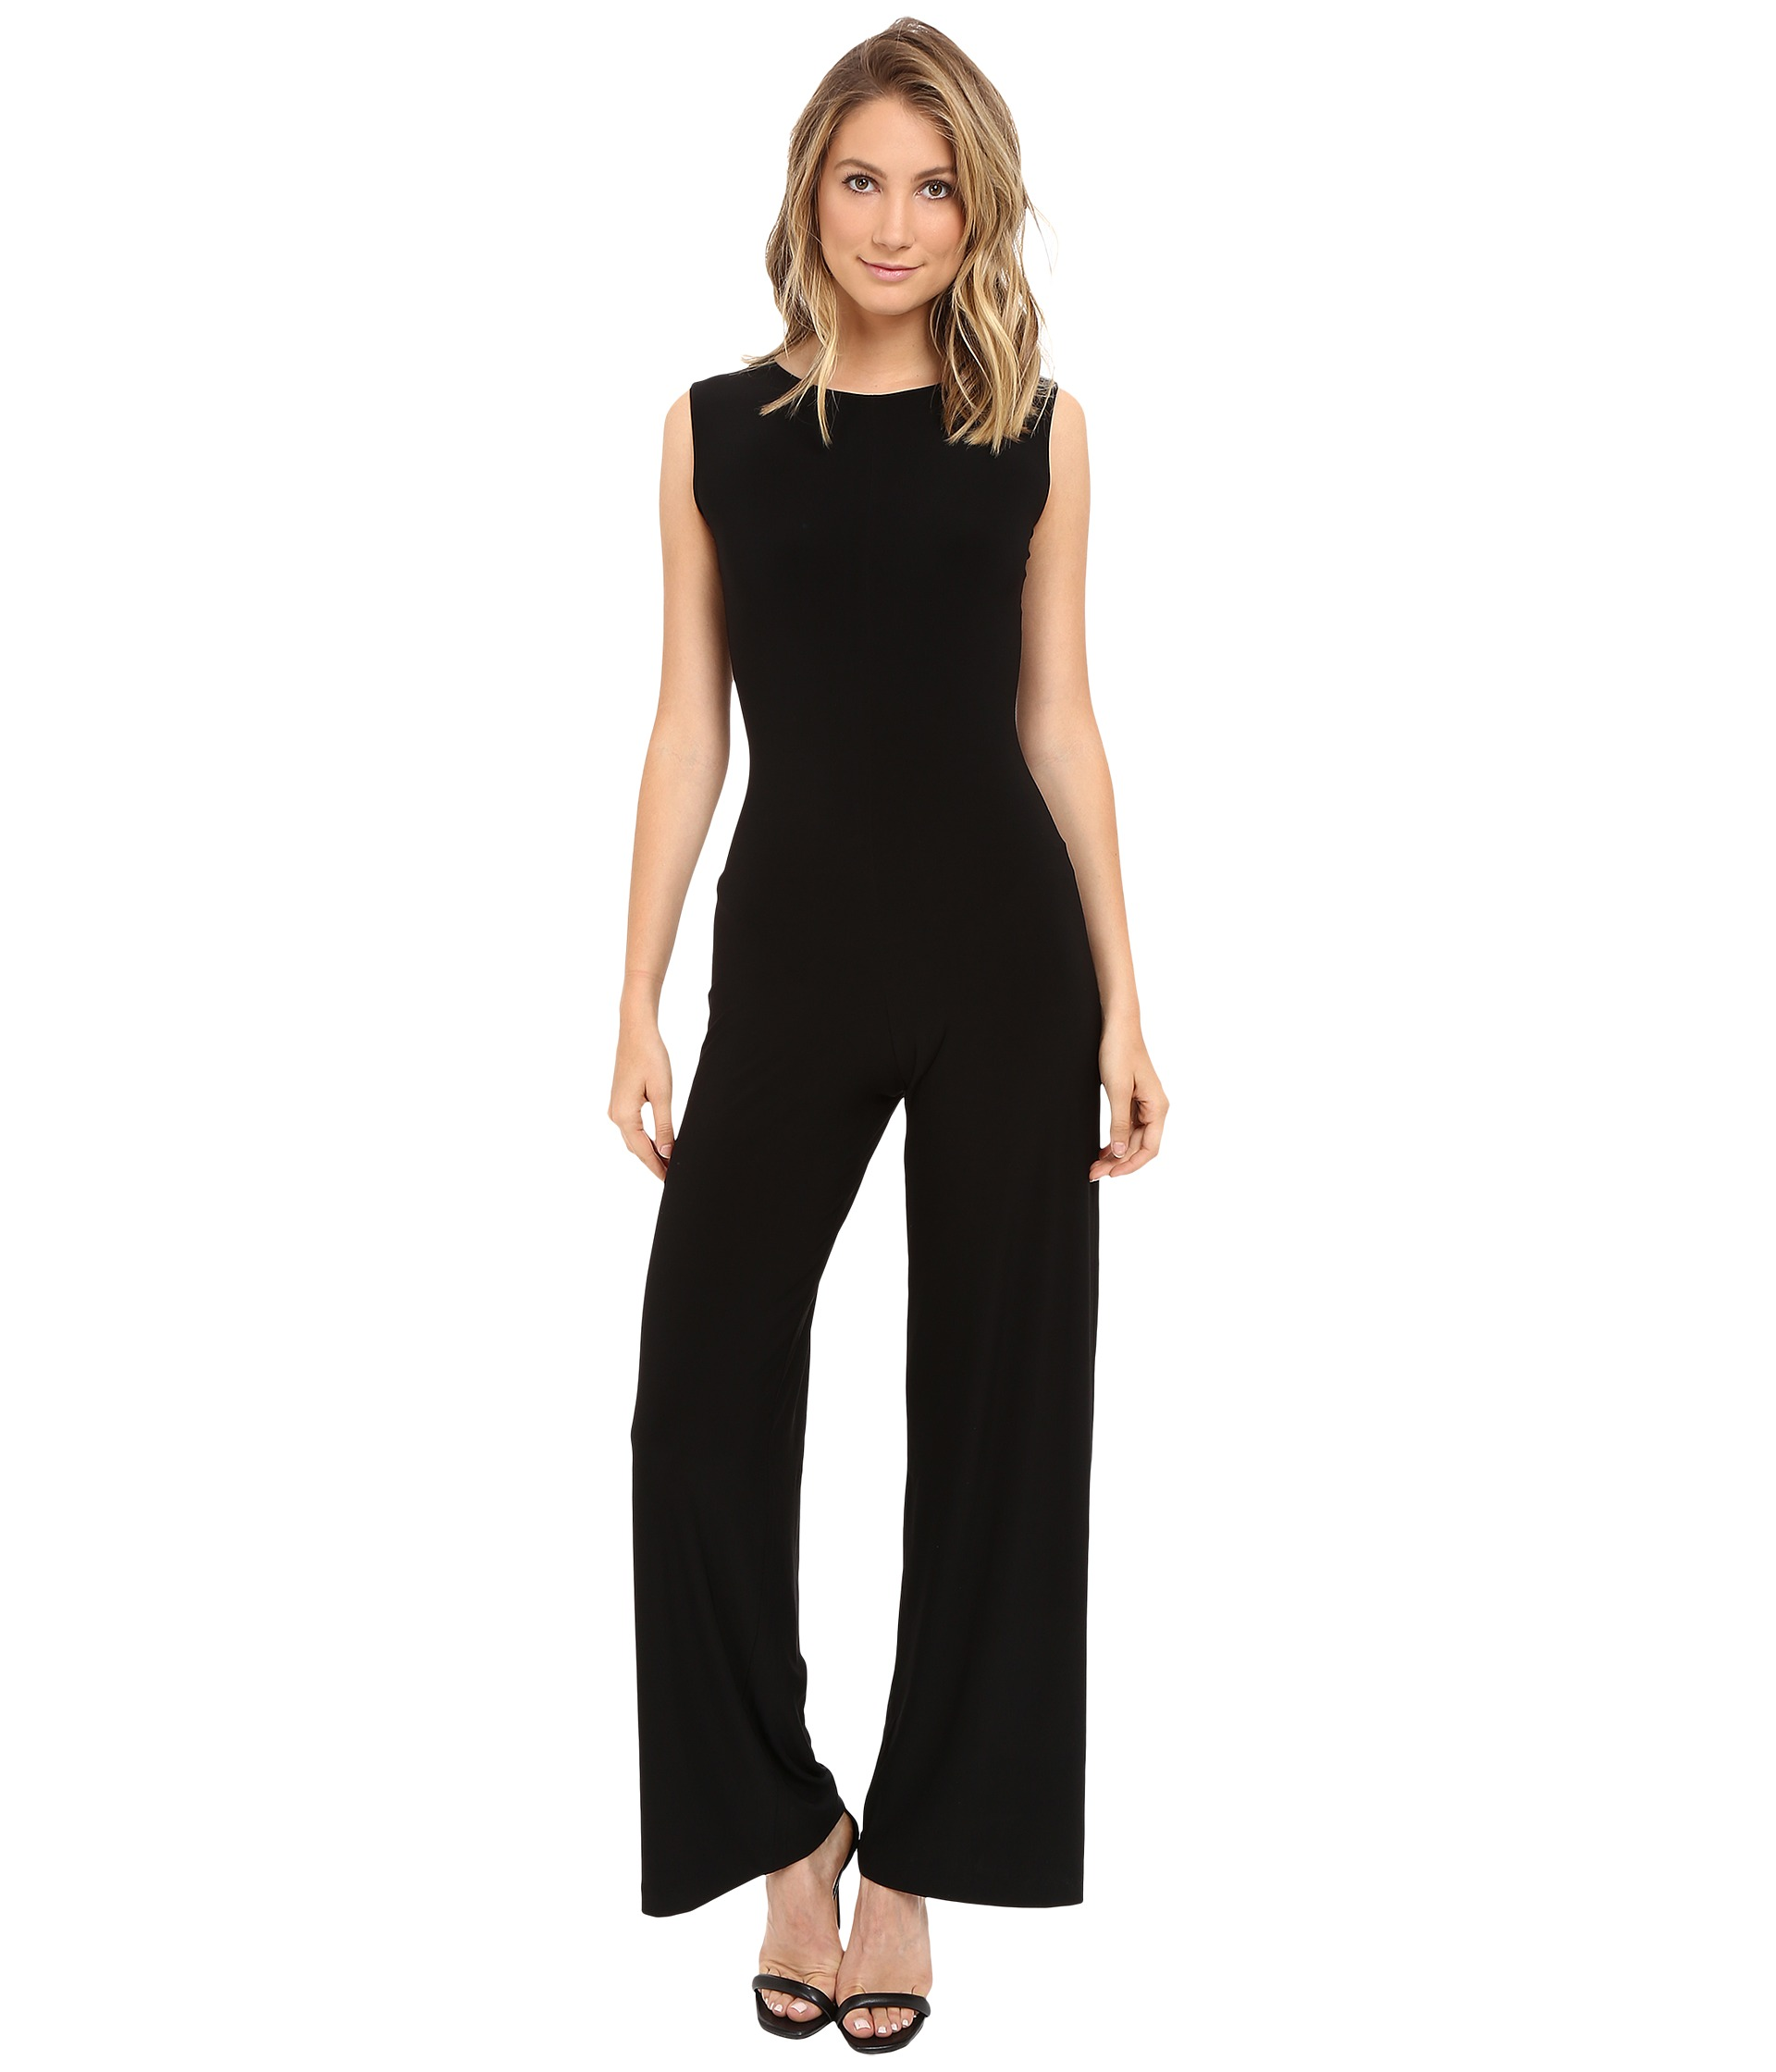 Kamalikulture Sleeveless Jumpsuit Clothing Women | Shipped Free At Zappos